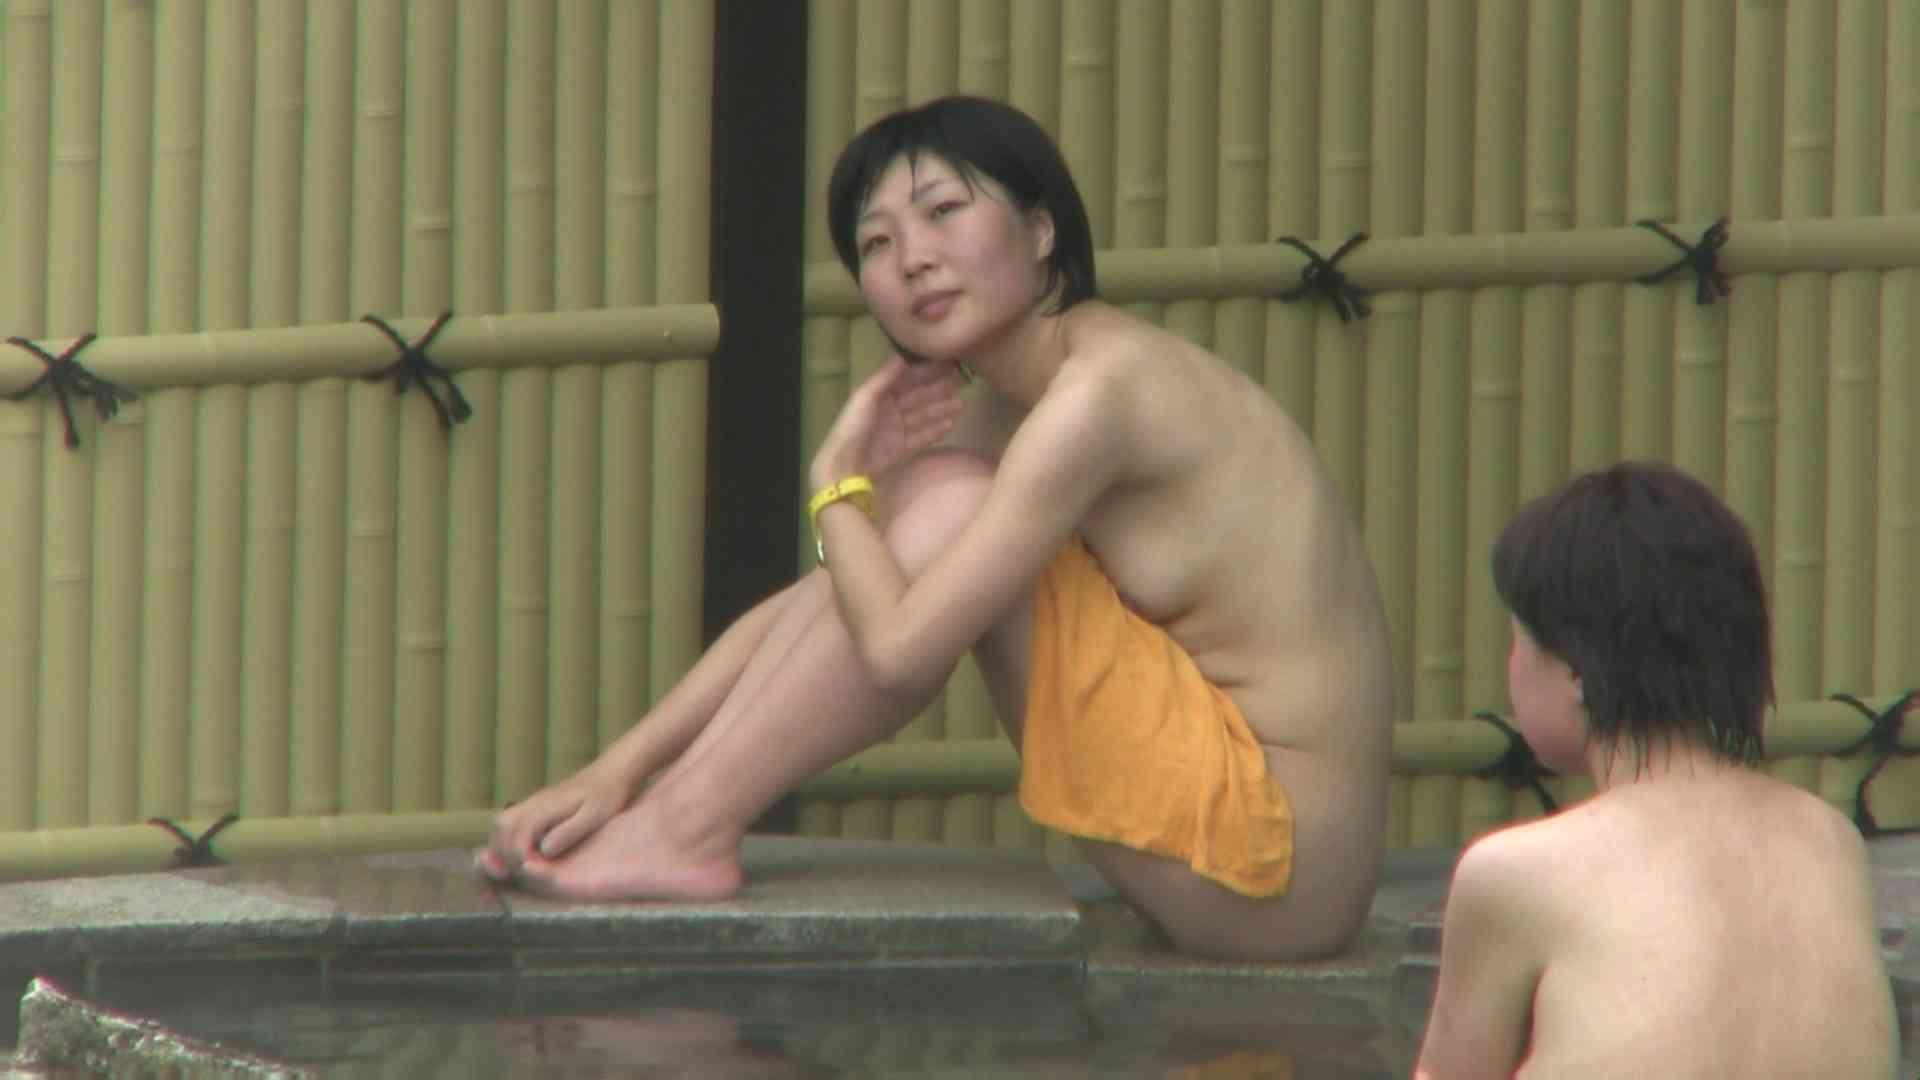 Aquaな露天風呂Vol.74【VIP限定】 露天風呂編  103PIX 24